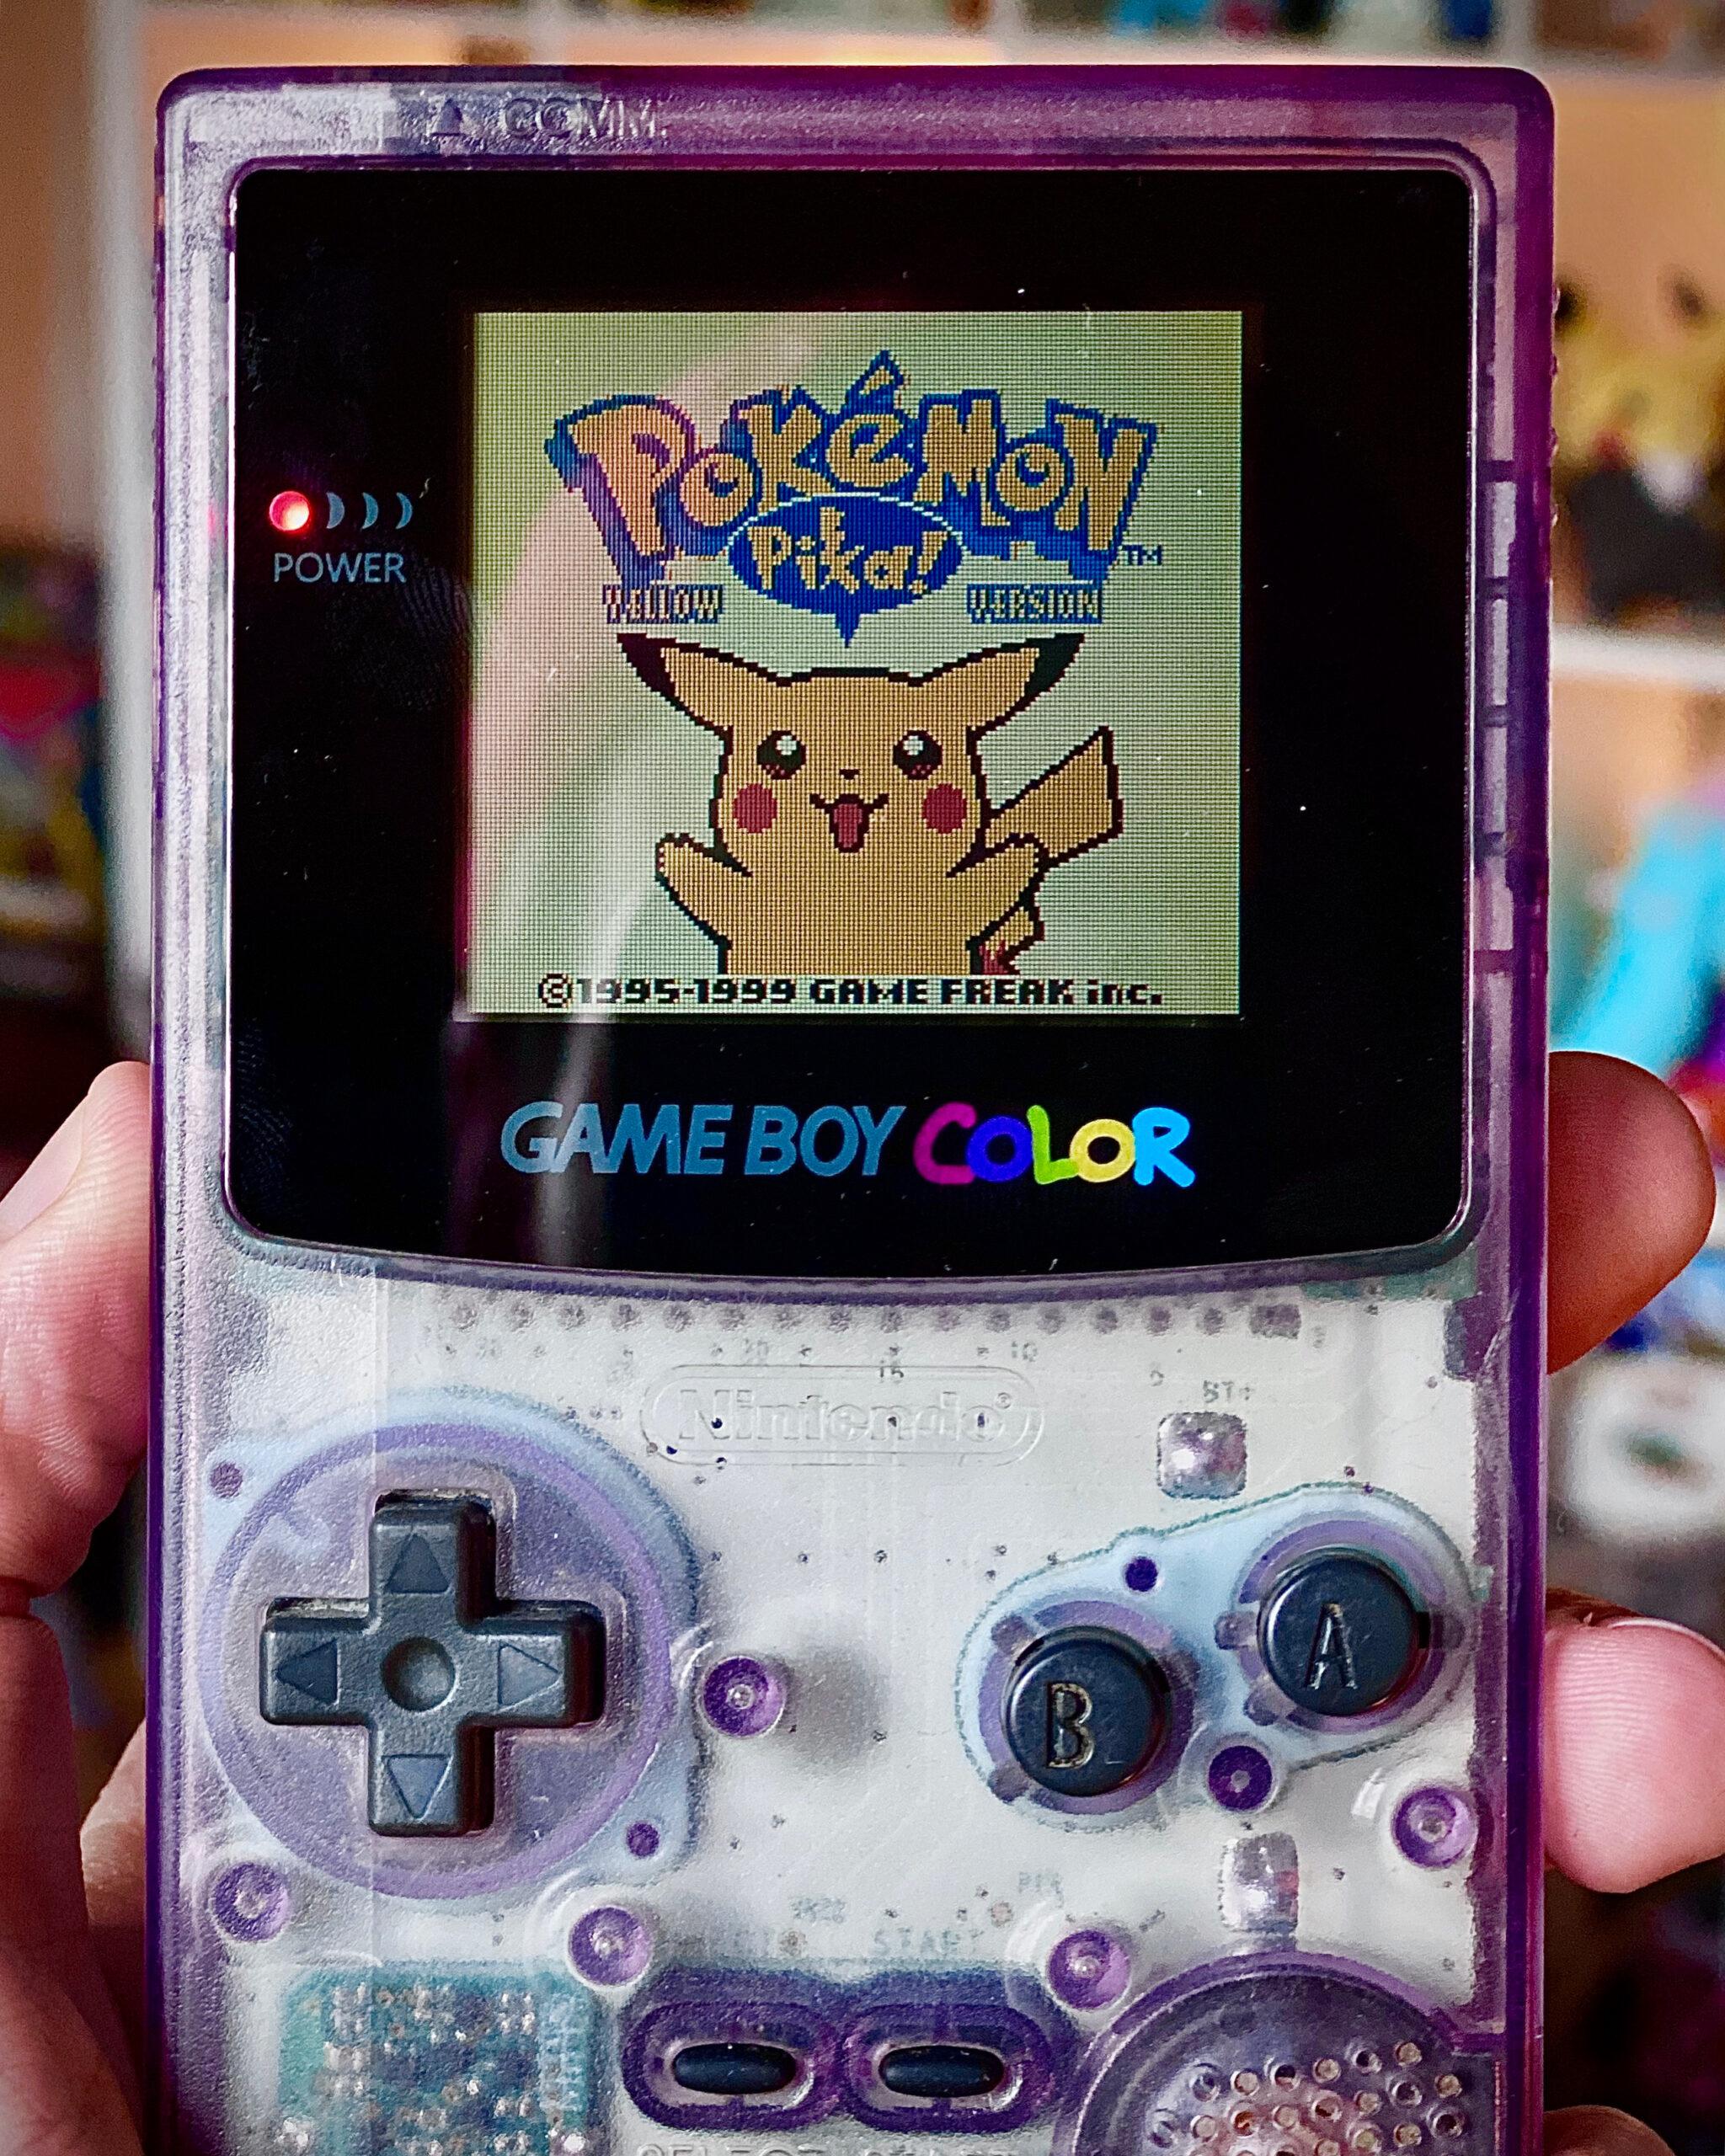 Pokémon Yellow Version GameBoy Color Cosmic Purple